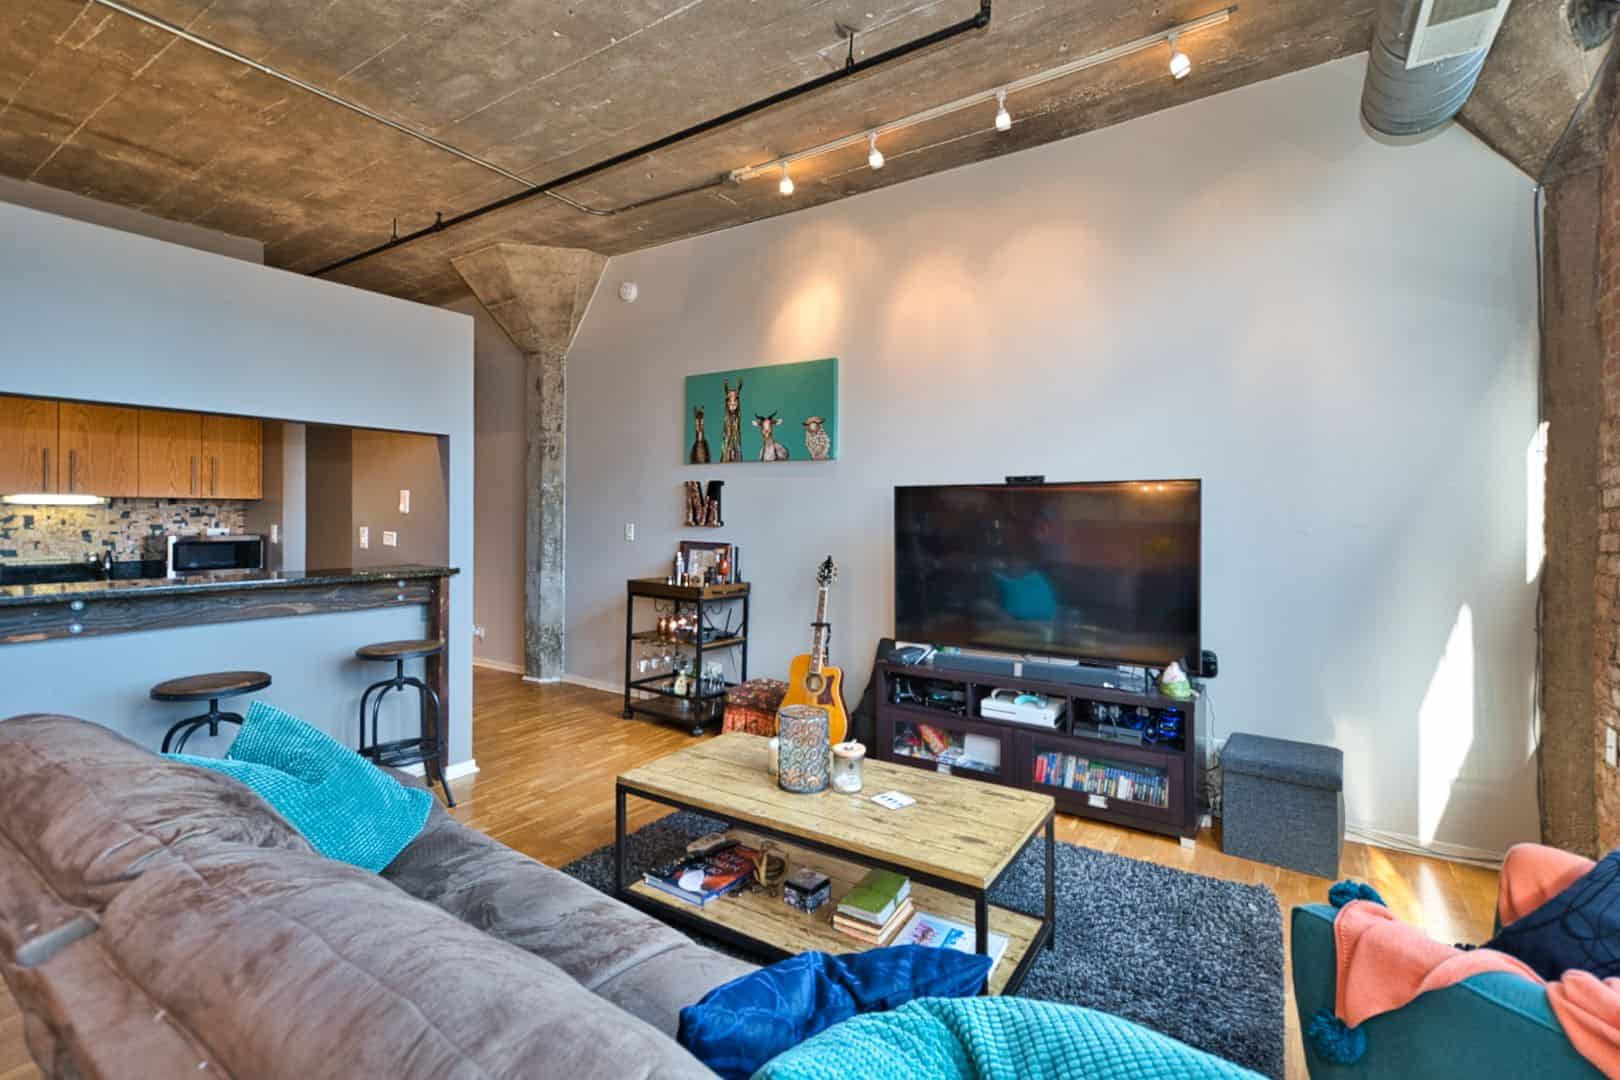 Printer's Row Concrete Loft - 621 S Plymouth Court, Unit 810, Chicago IL 60605 USA - Living Area